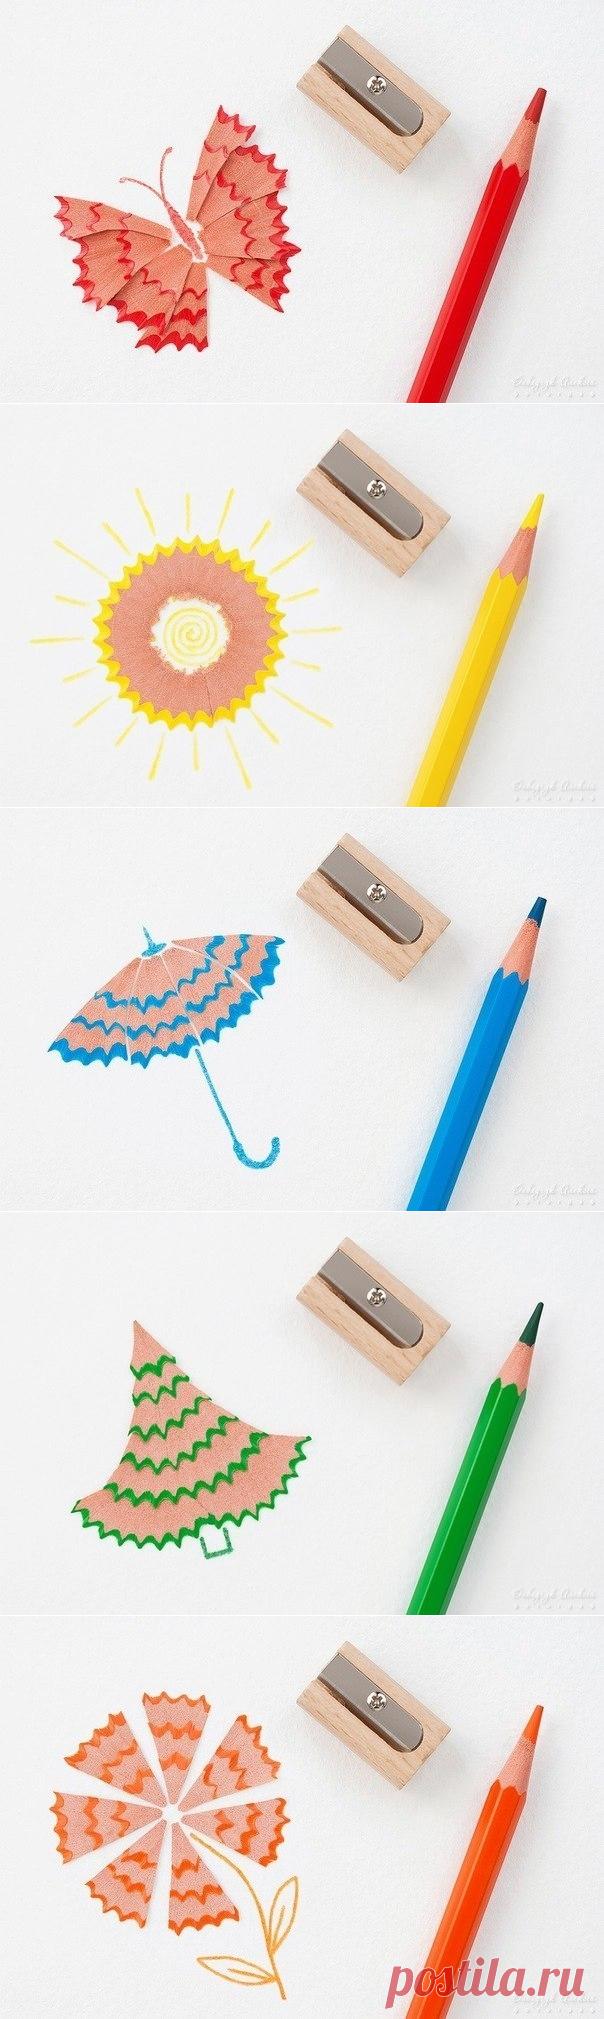 картинки из остатков карандаша кричу